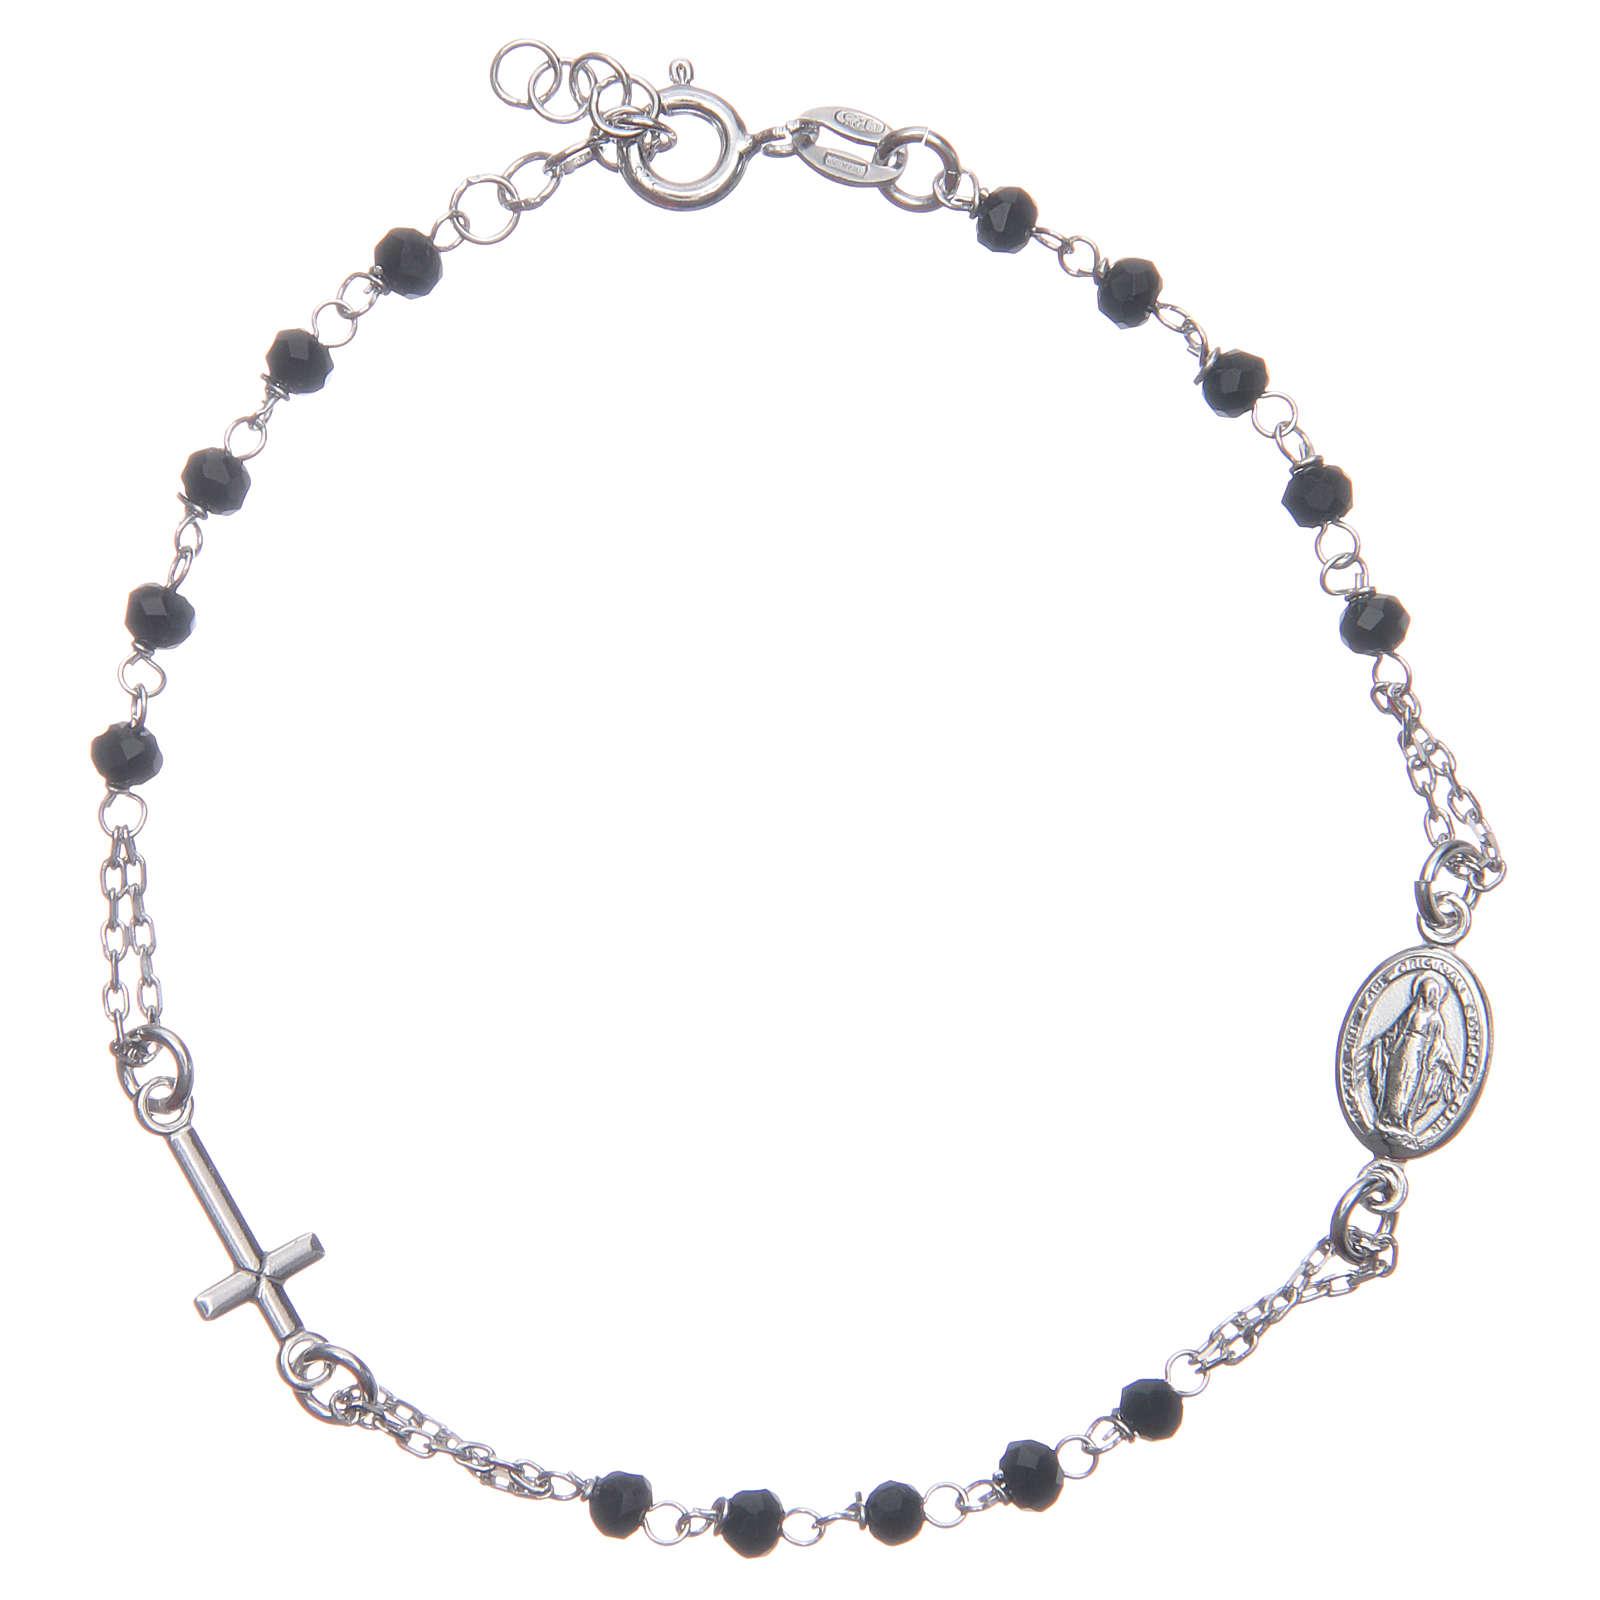 Bracciale rosario colore nero argento 925 4